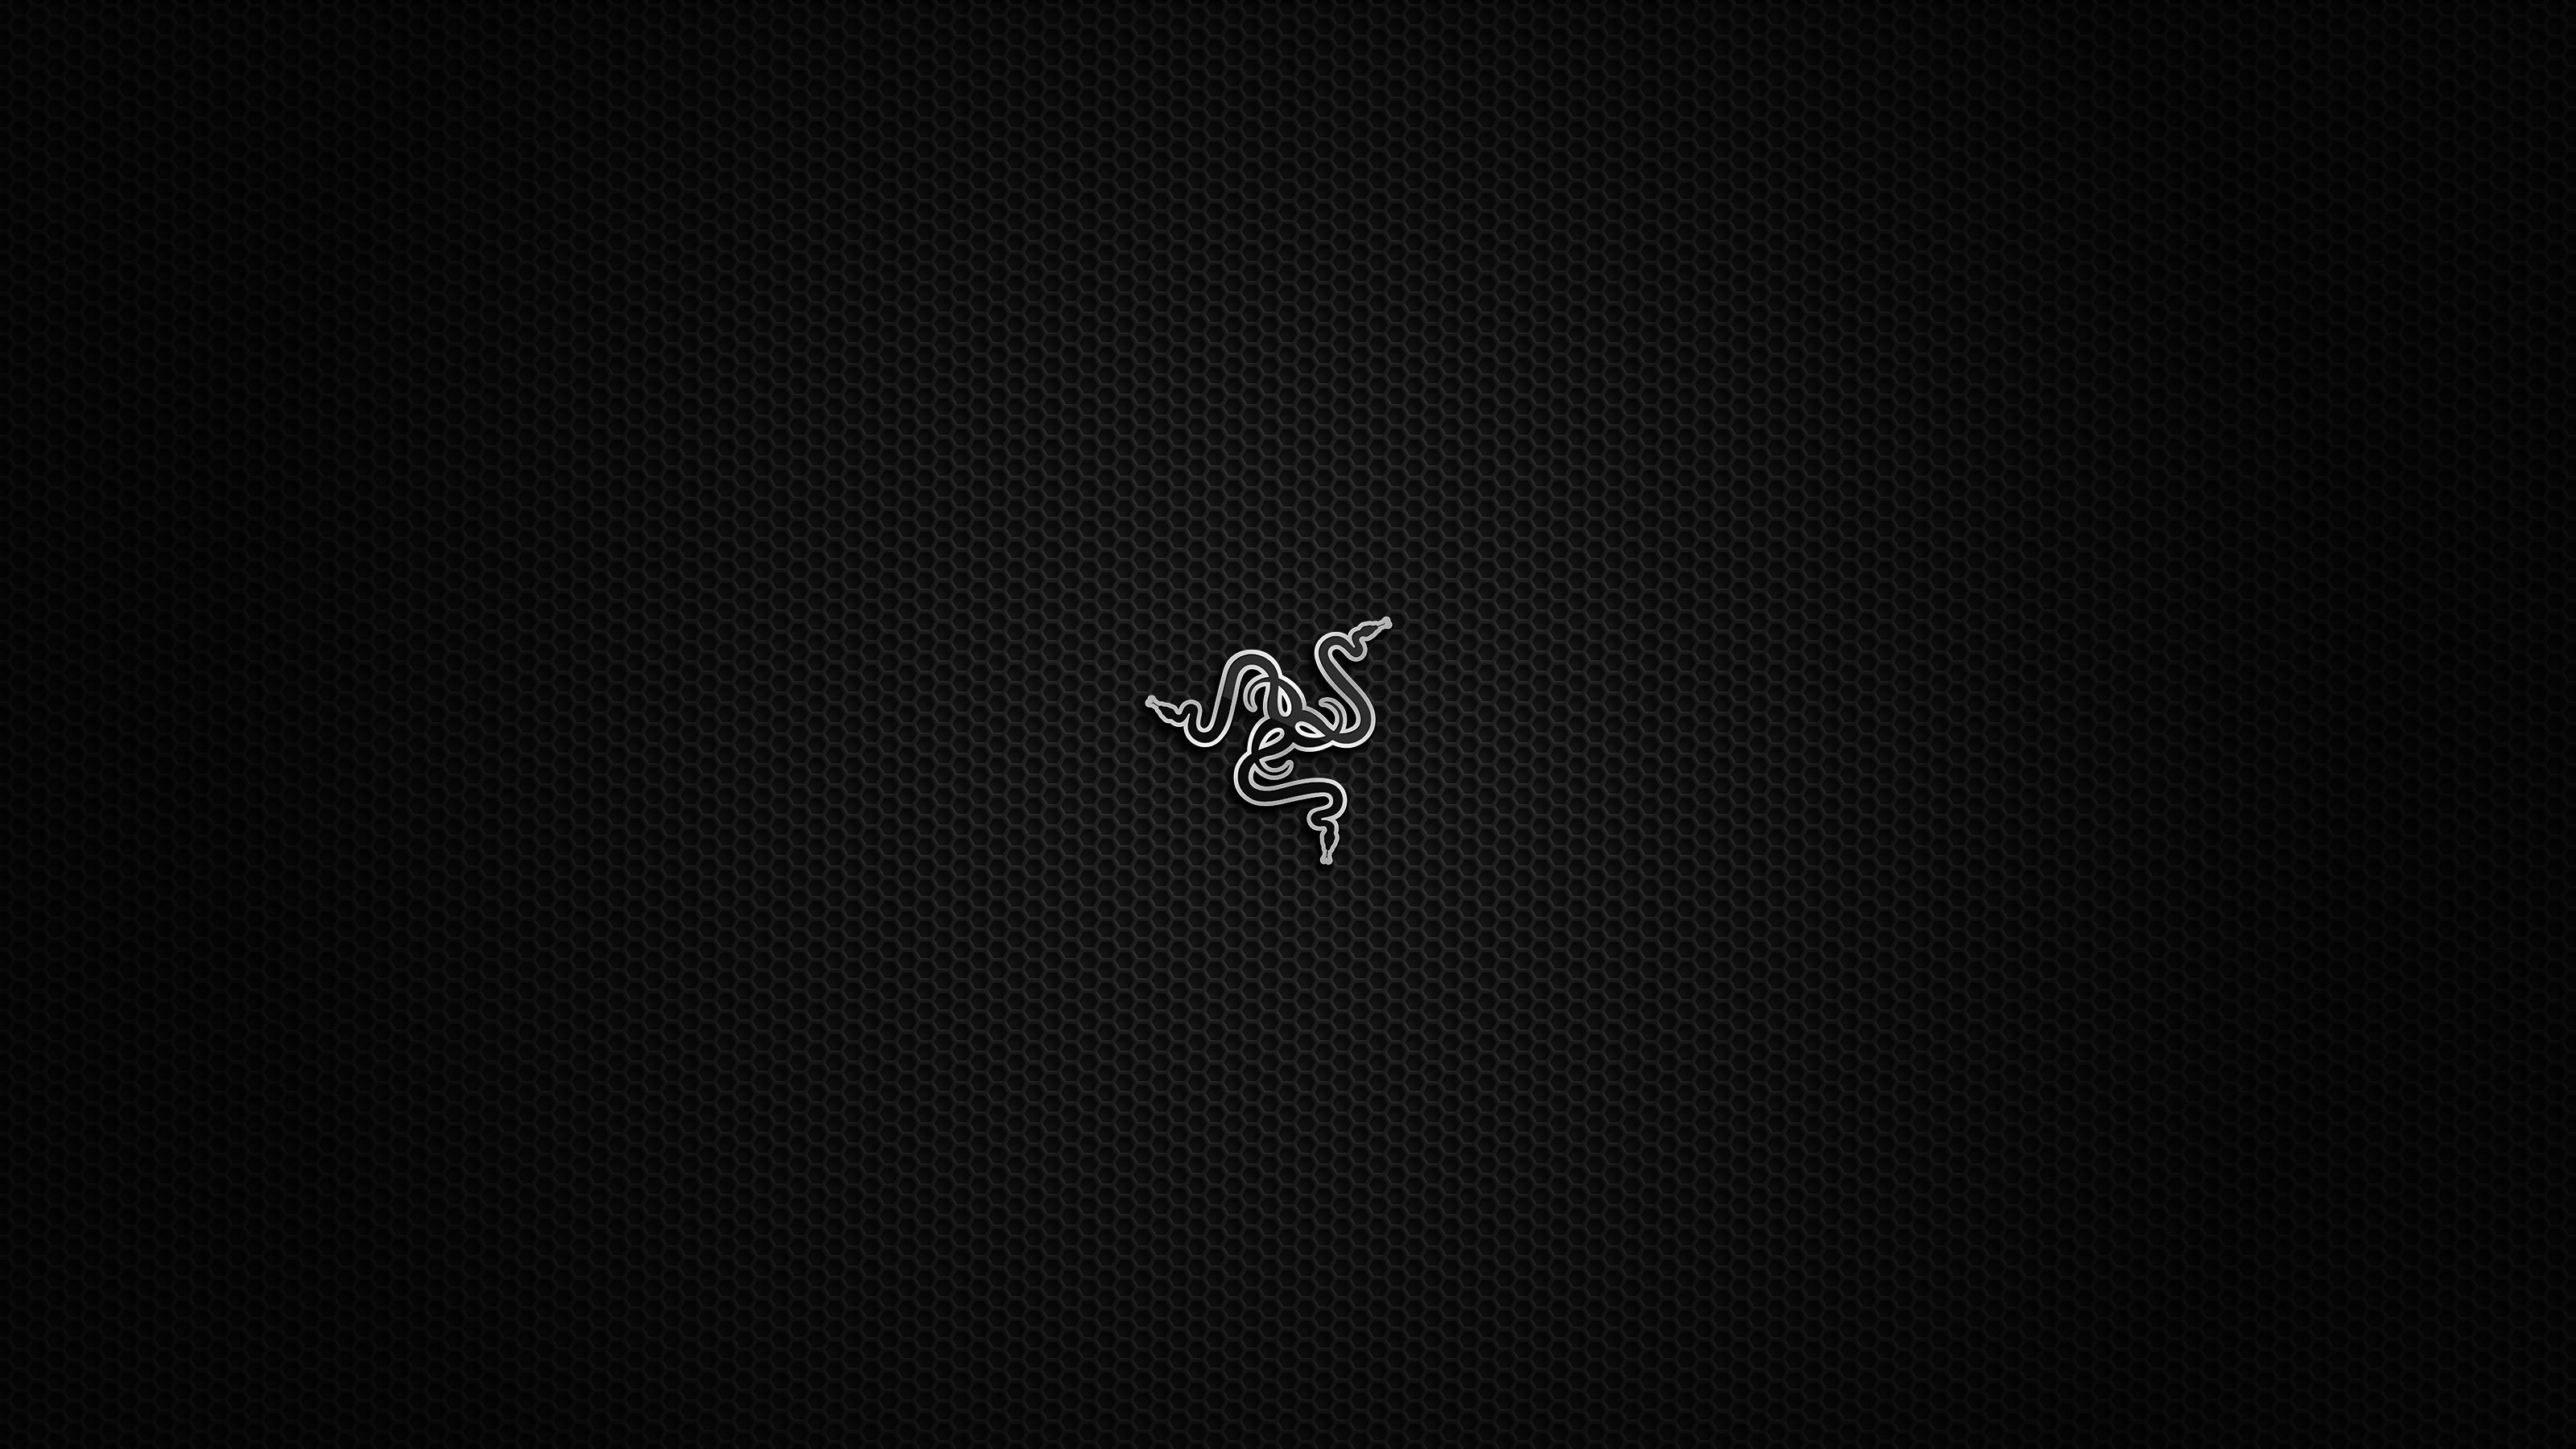 Razer Launches The Razer Blade Stealth Ultrabook And Razer Core At ...